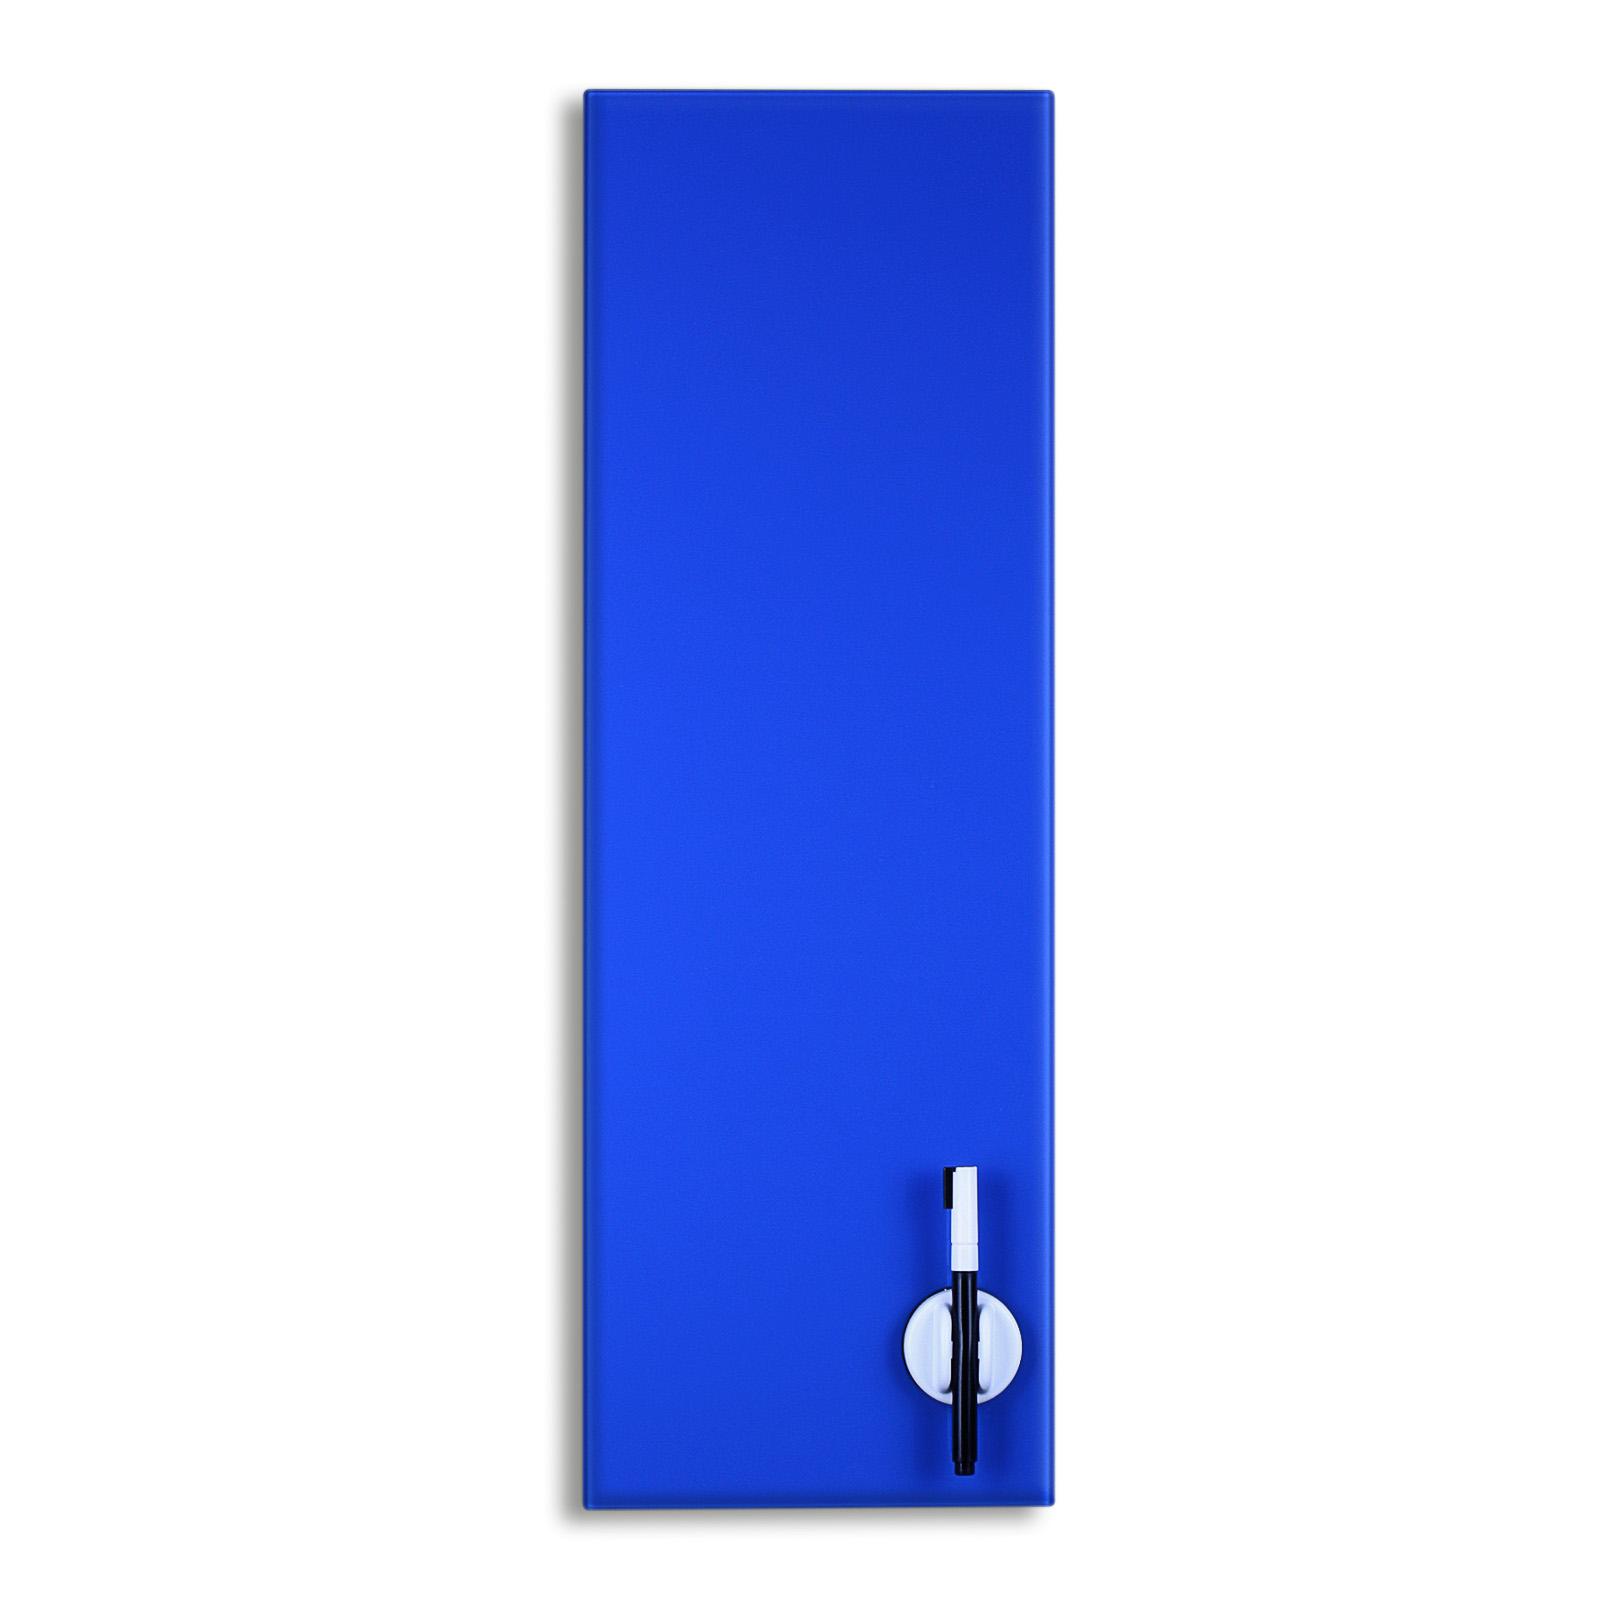 neu glas magnettafel magnetboard memoboard versch farben und gr en b romi. Black Bedroom Furniture Sets. Home Design Ideas